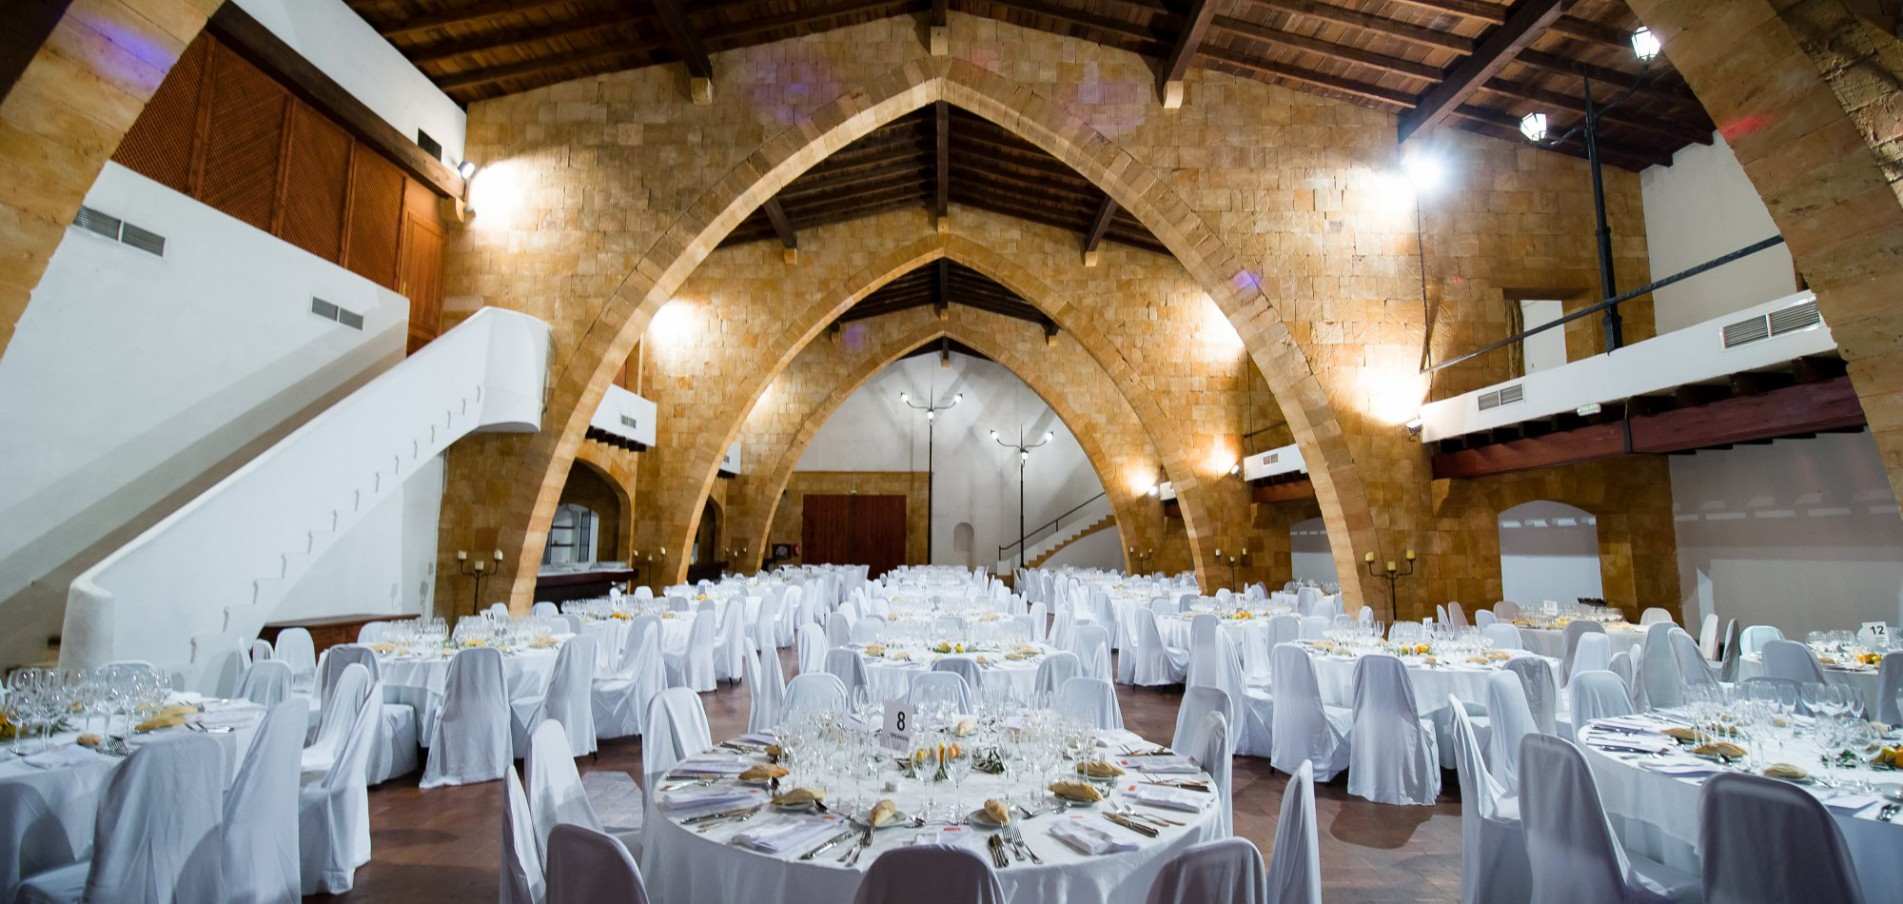 Kongress auf Mallorca 700 Gäste aus aller Welt